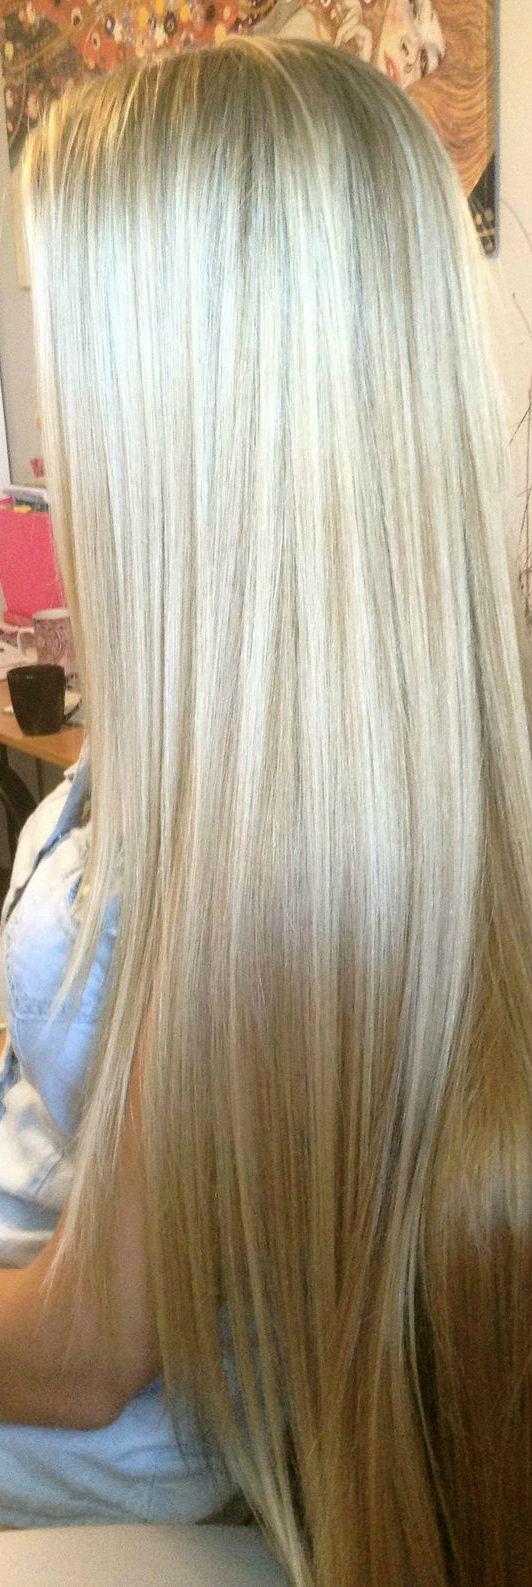 Gorgeous blonde hair - long silky and shiny - longhair ambh schwarzkopf